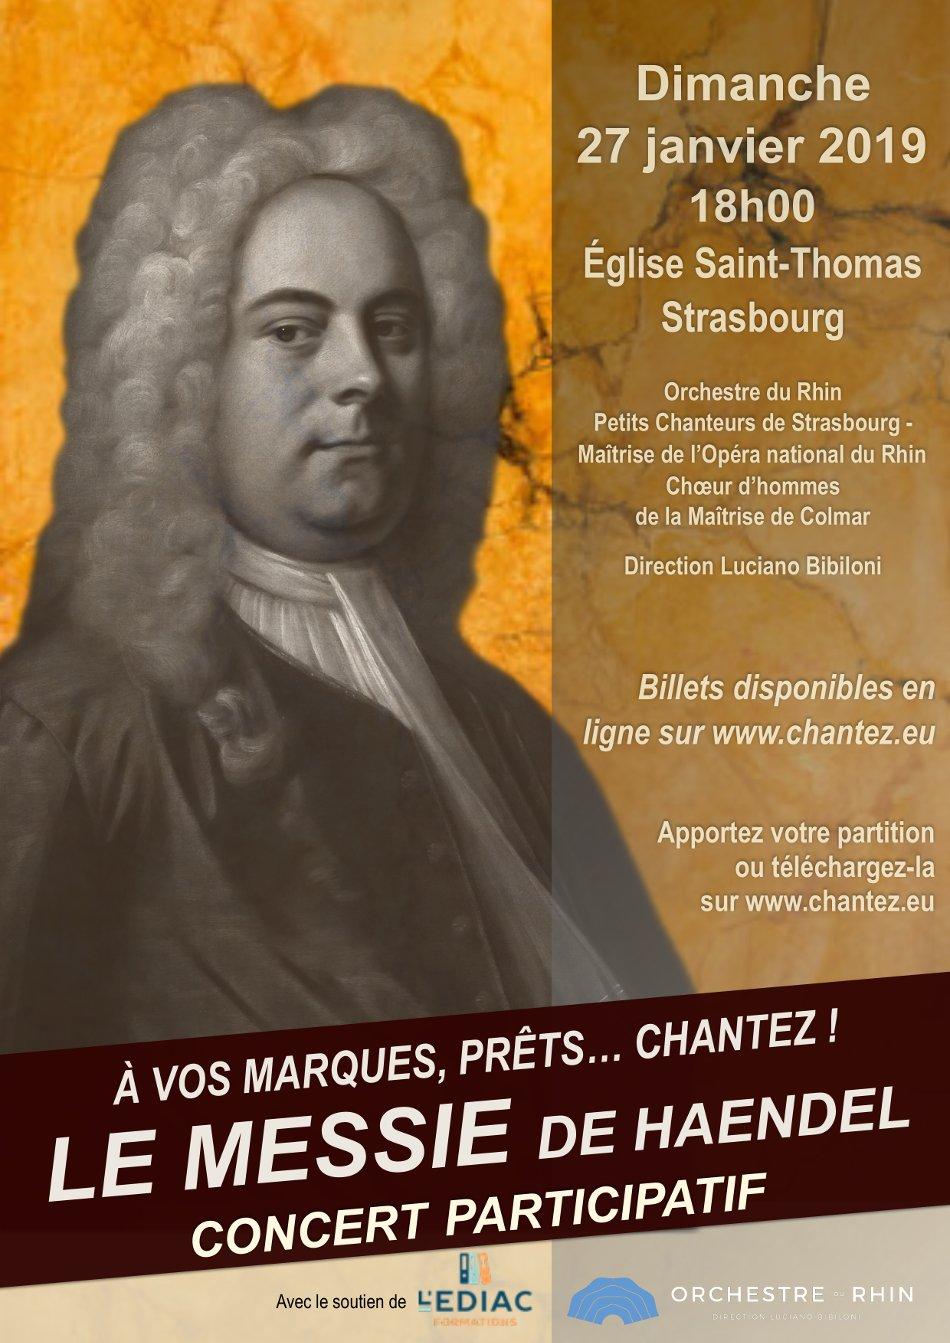 Concert Le Messie de Haendel Strasbourg